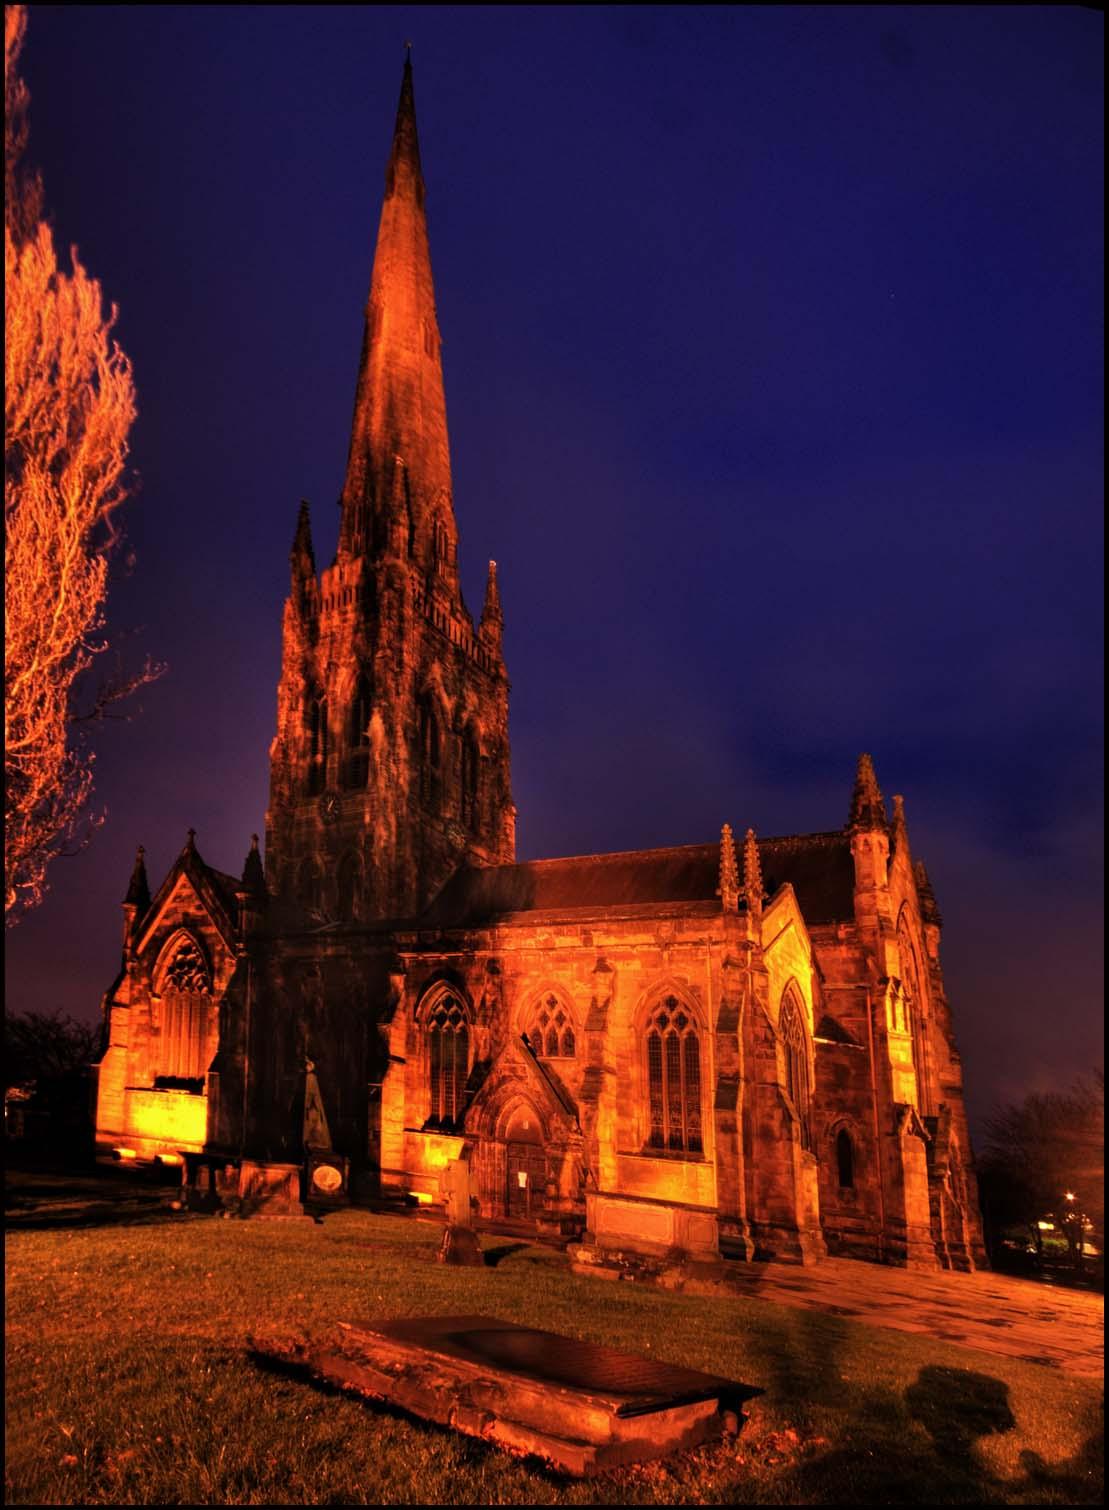 St.,Elphin's,Church,Warrington,town,cheshire,england,UK,GB,street,NW,north,west,urban,Parish,Elphin,tower,saint,elfins,worship,its,grim,up,orange,dusk,night,shot,blue,sky,magic,hour,grave,yard,graveyard,Lancashire,tripod,available,light,available light,ambiant,magic hour,northwest,britain,365days,HDR,high dynamic range,tonysmith,tony,smith,highway,road,noche,nuit,hotpix!